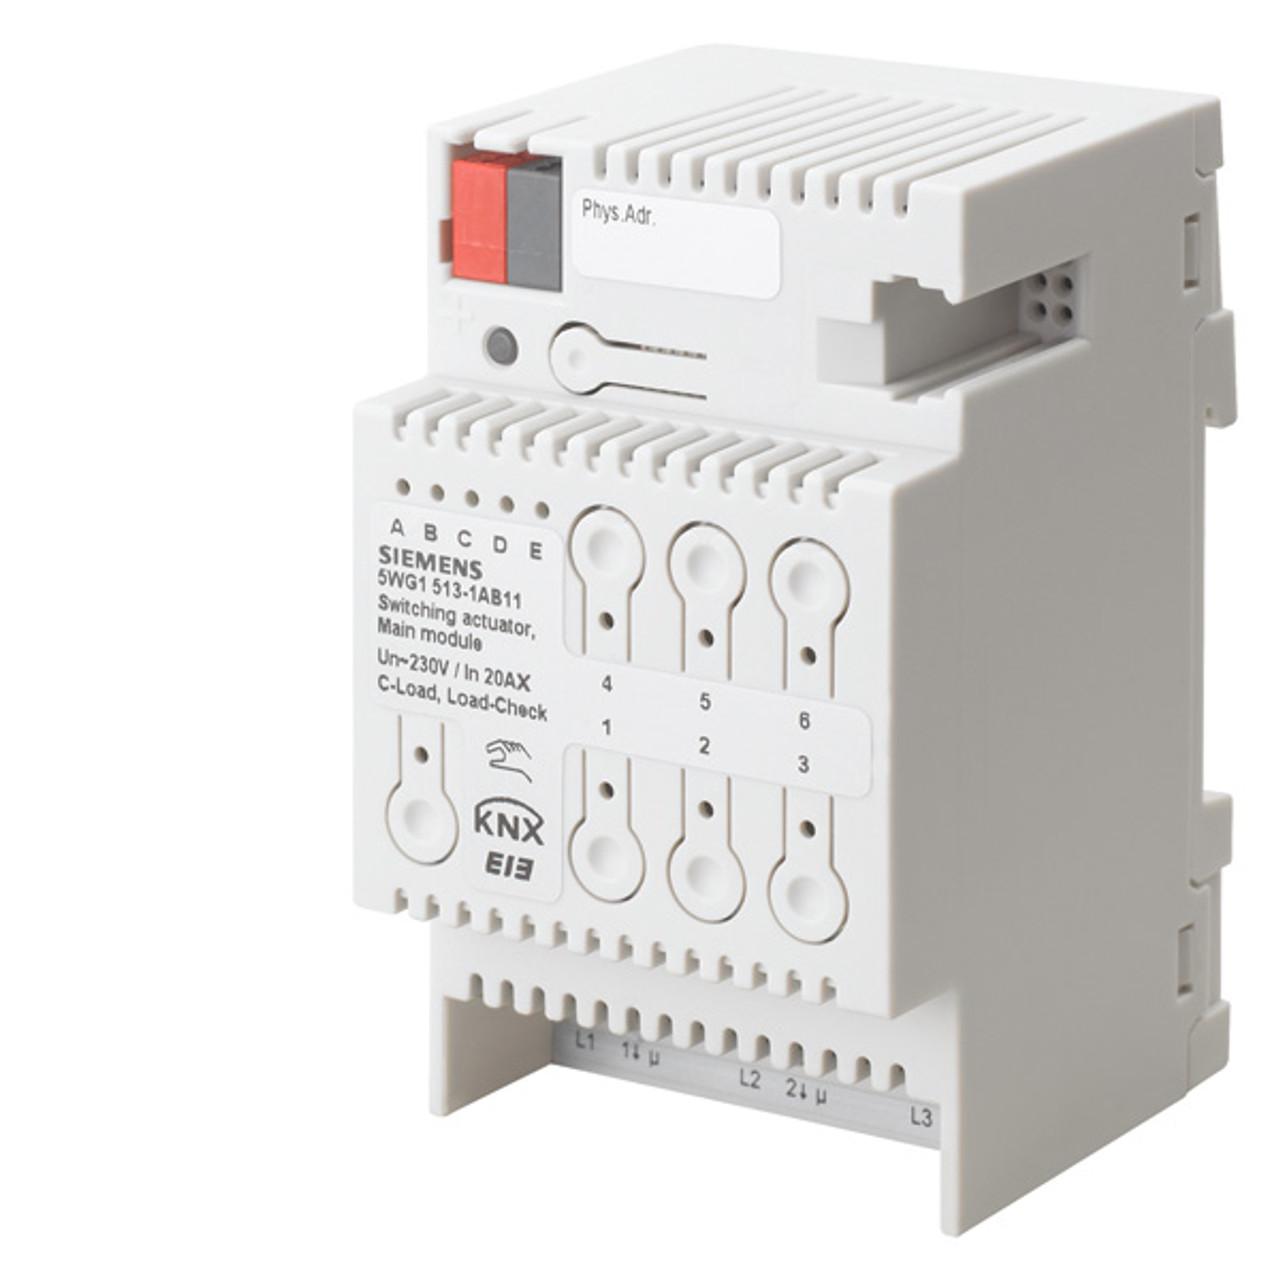 Siemens 5WG1513-1AB11